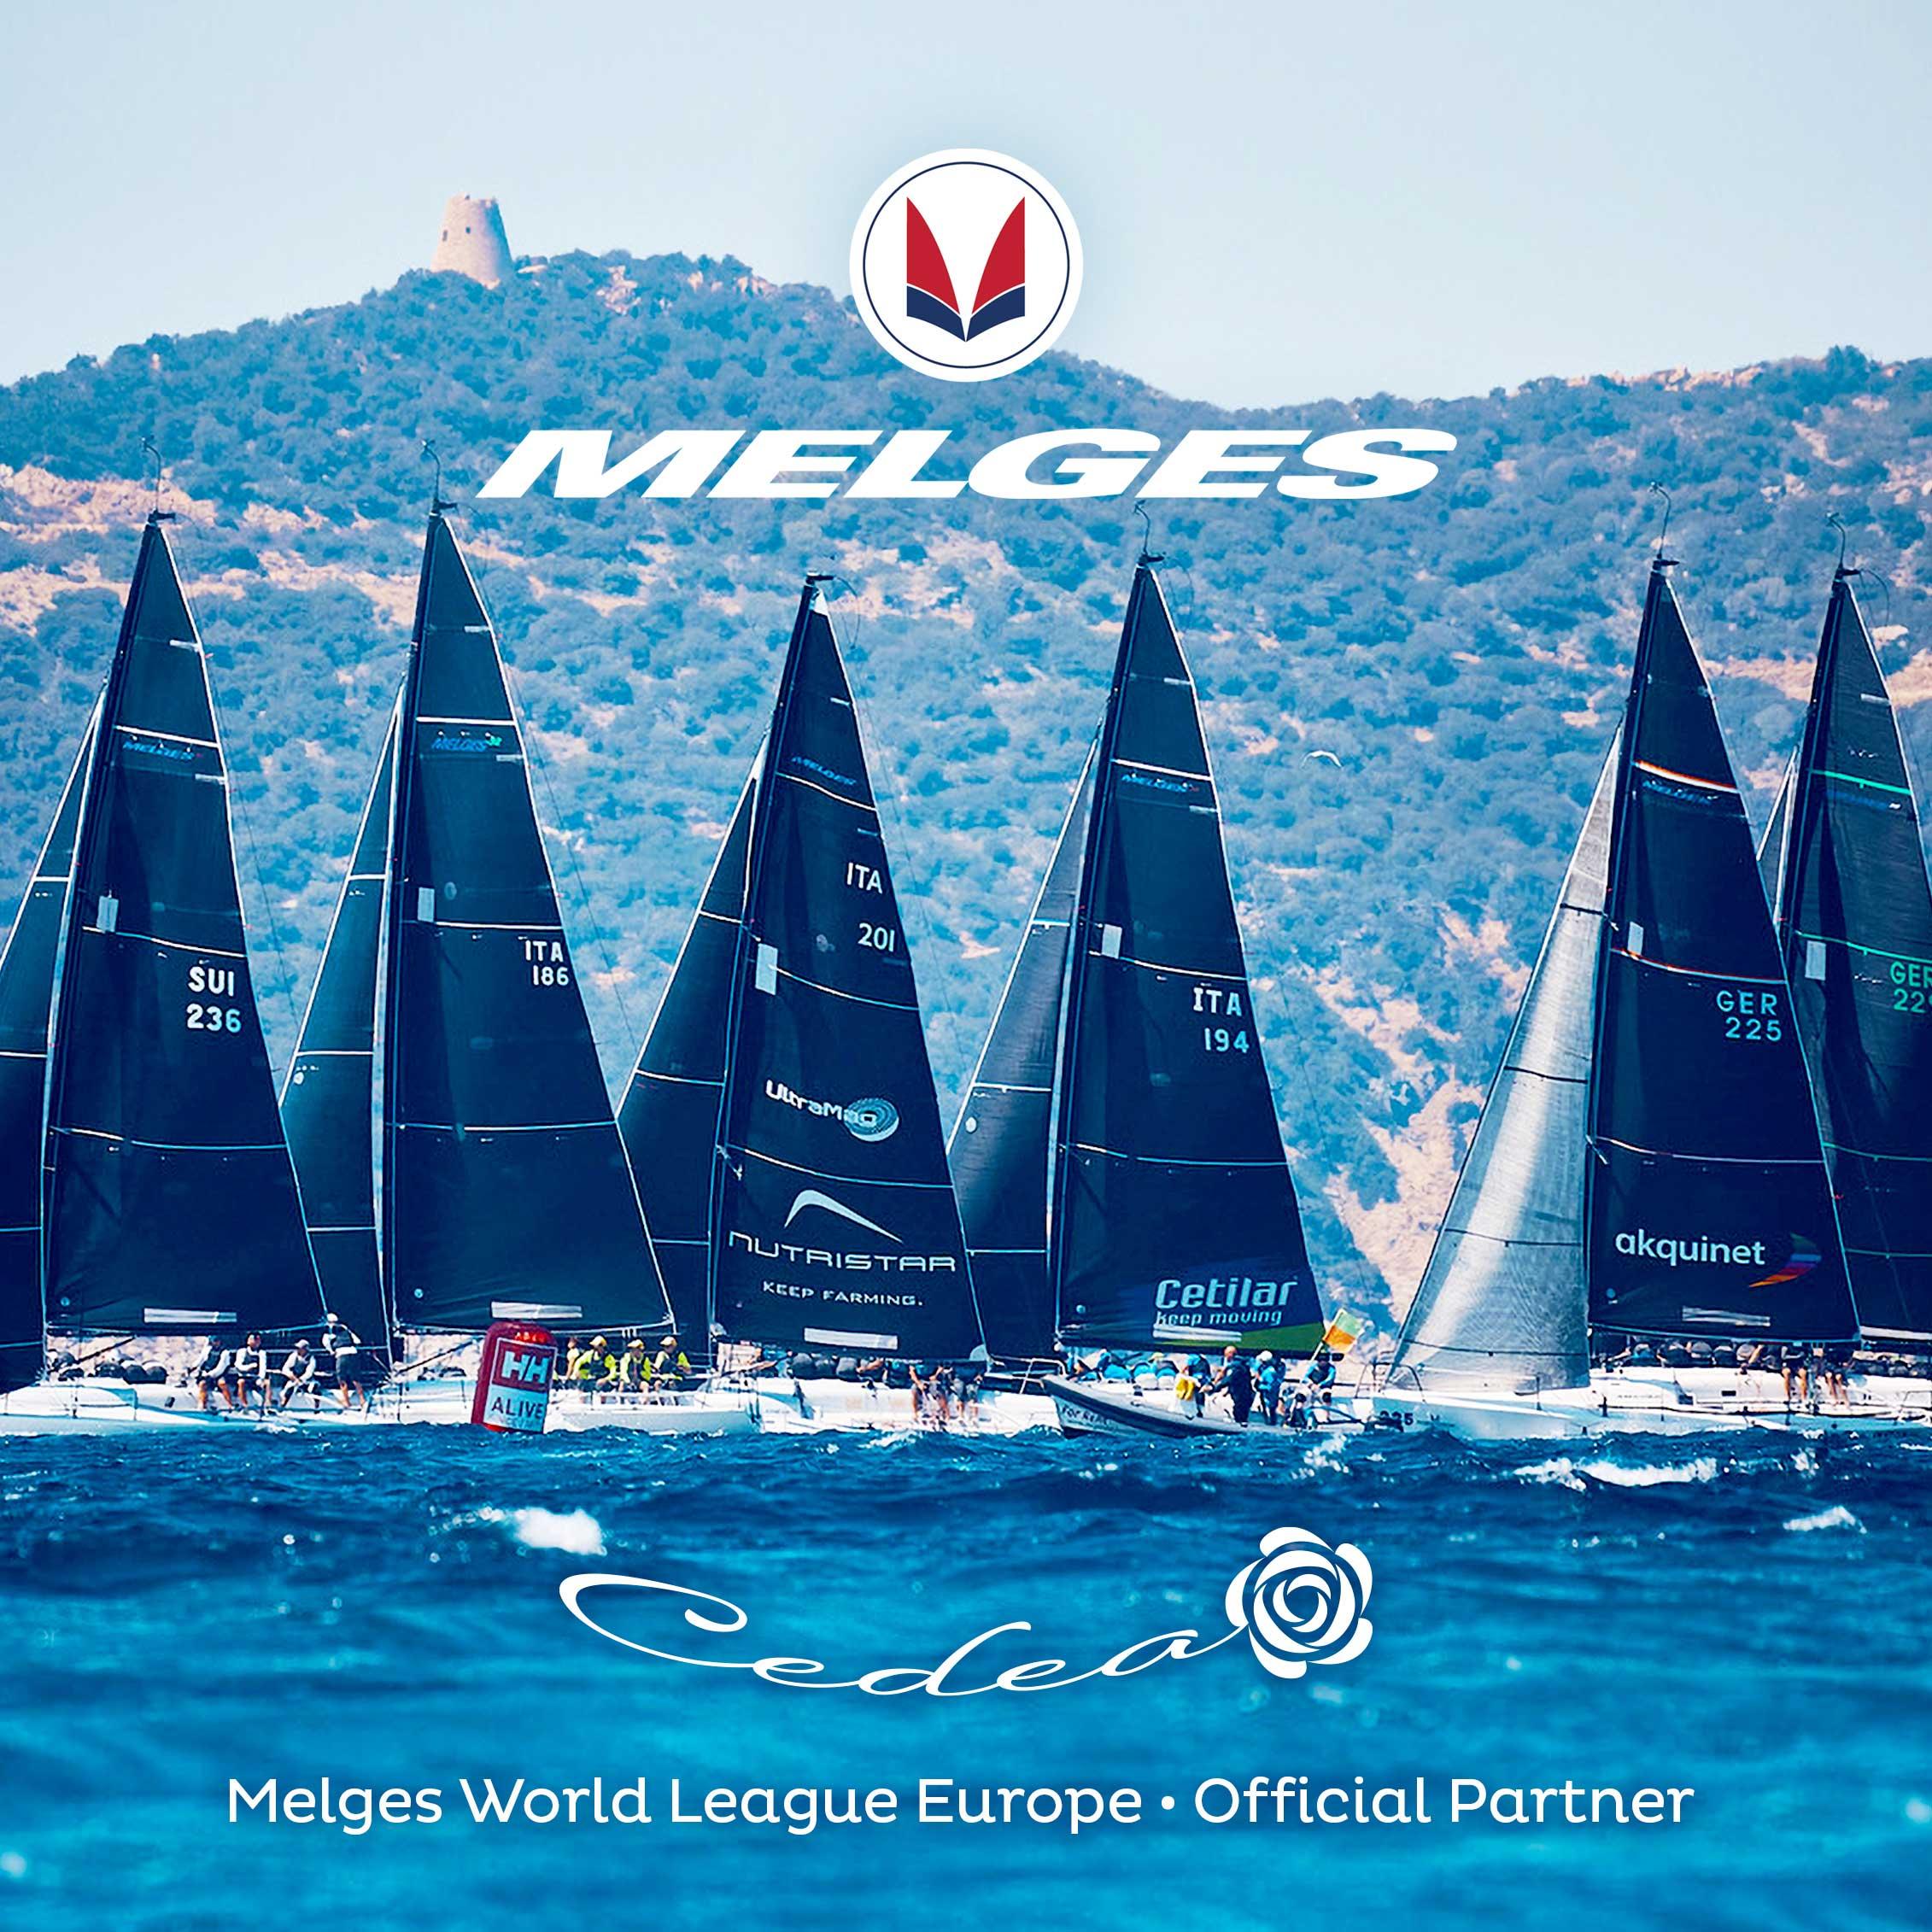 Melges performance boats